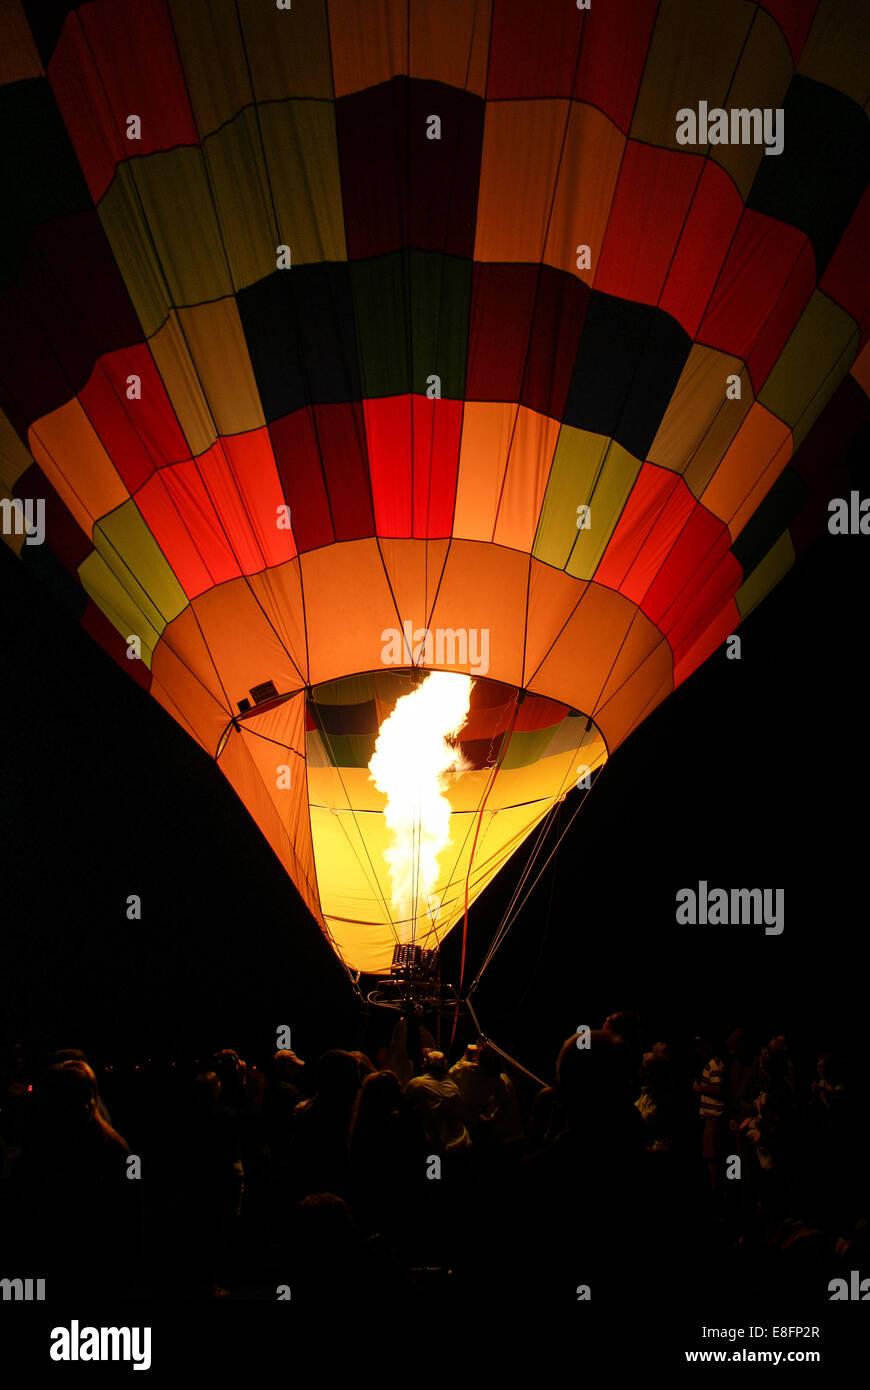 USA, Utah, Eden, Hot Air Balloon taking off during Ogden Valley Balloon Festival - Stock Image